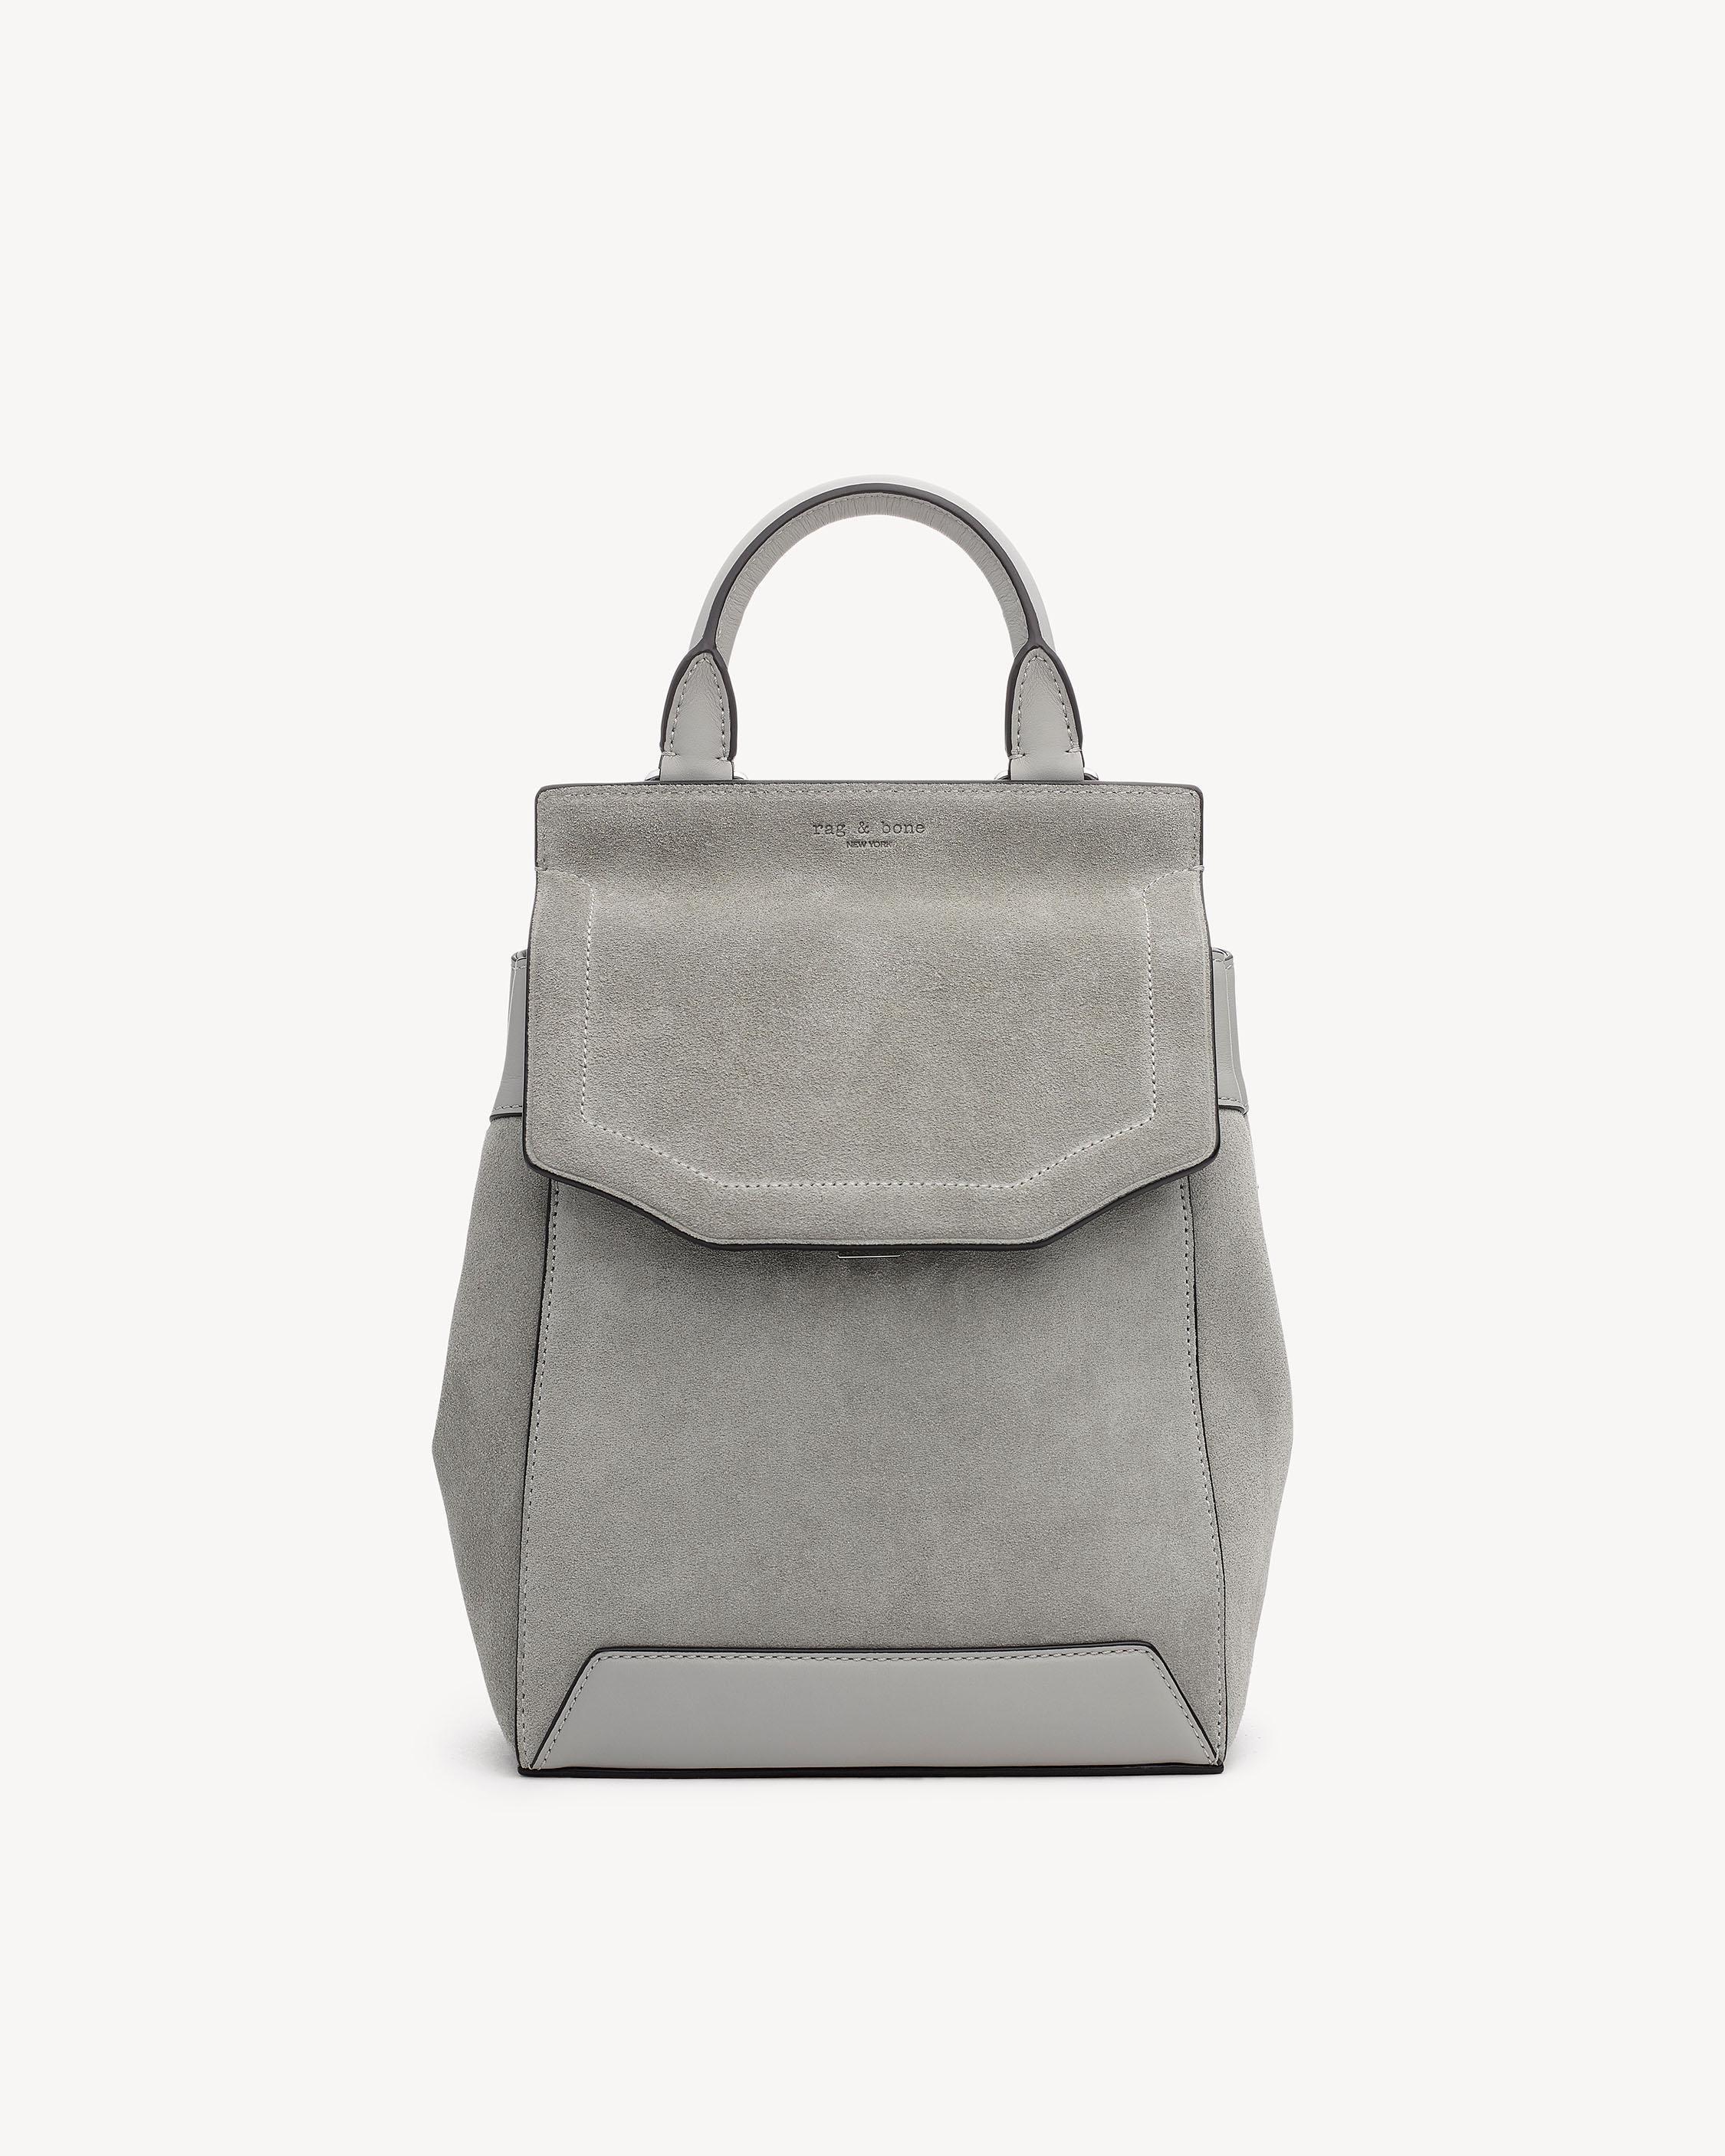 b6da0736a52e Mini Backpacks Spring Handbag Trend For Women